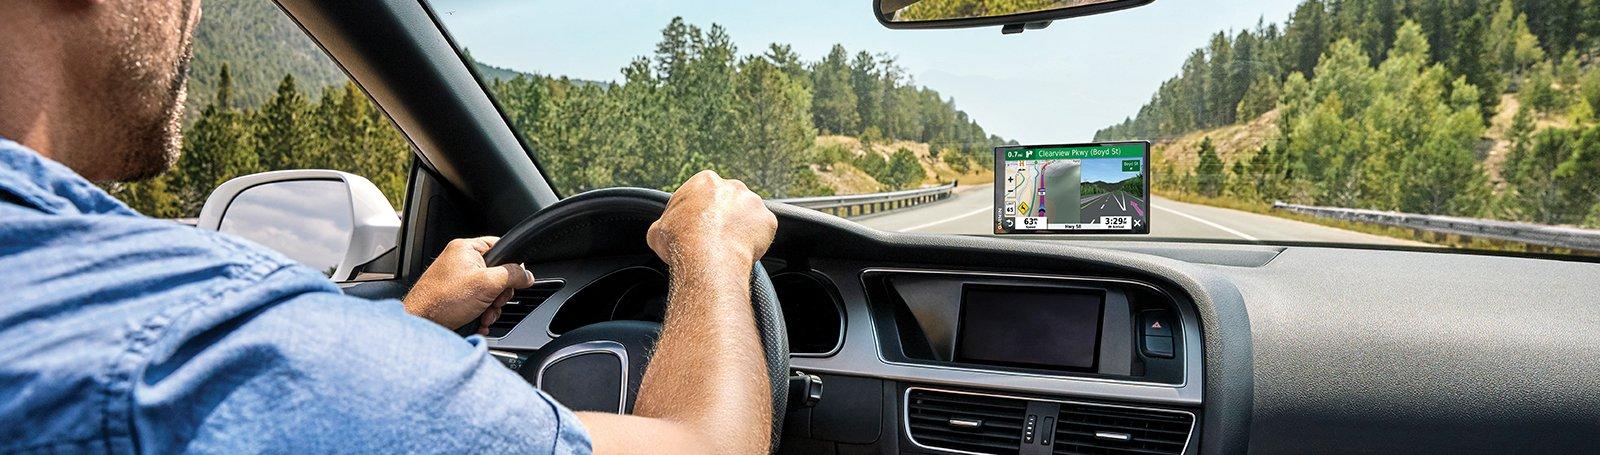 Garmin nuvi 250 pink auto navigation system